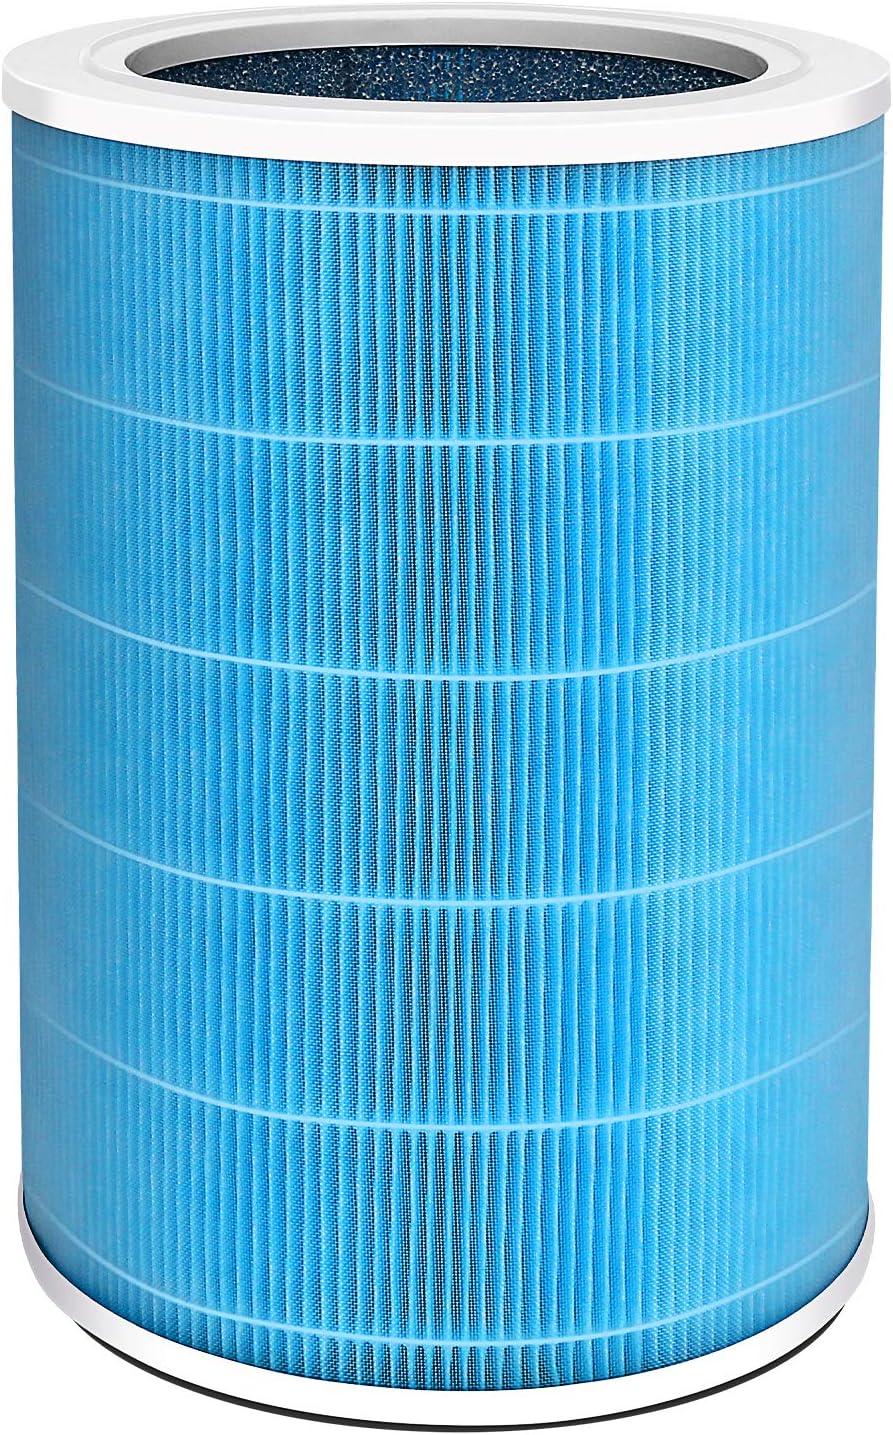 ASLOTUS KJ320 Air Sale special sale price Purifier Replacement HEPA Filter